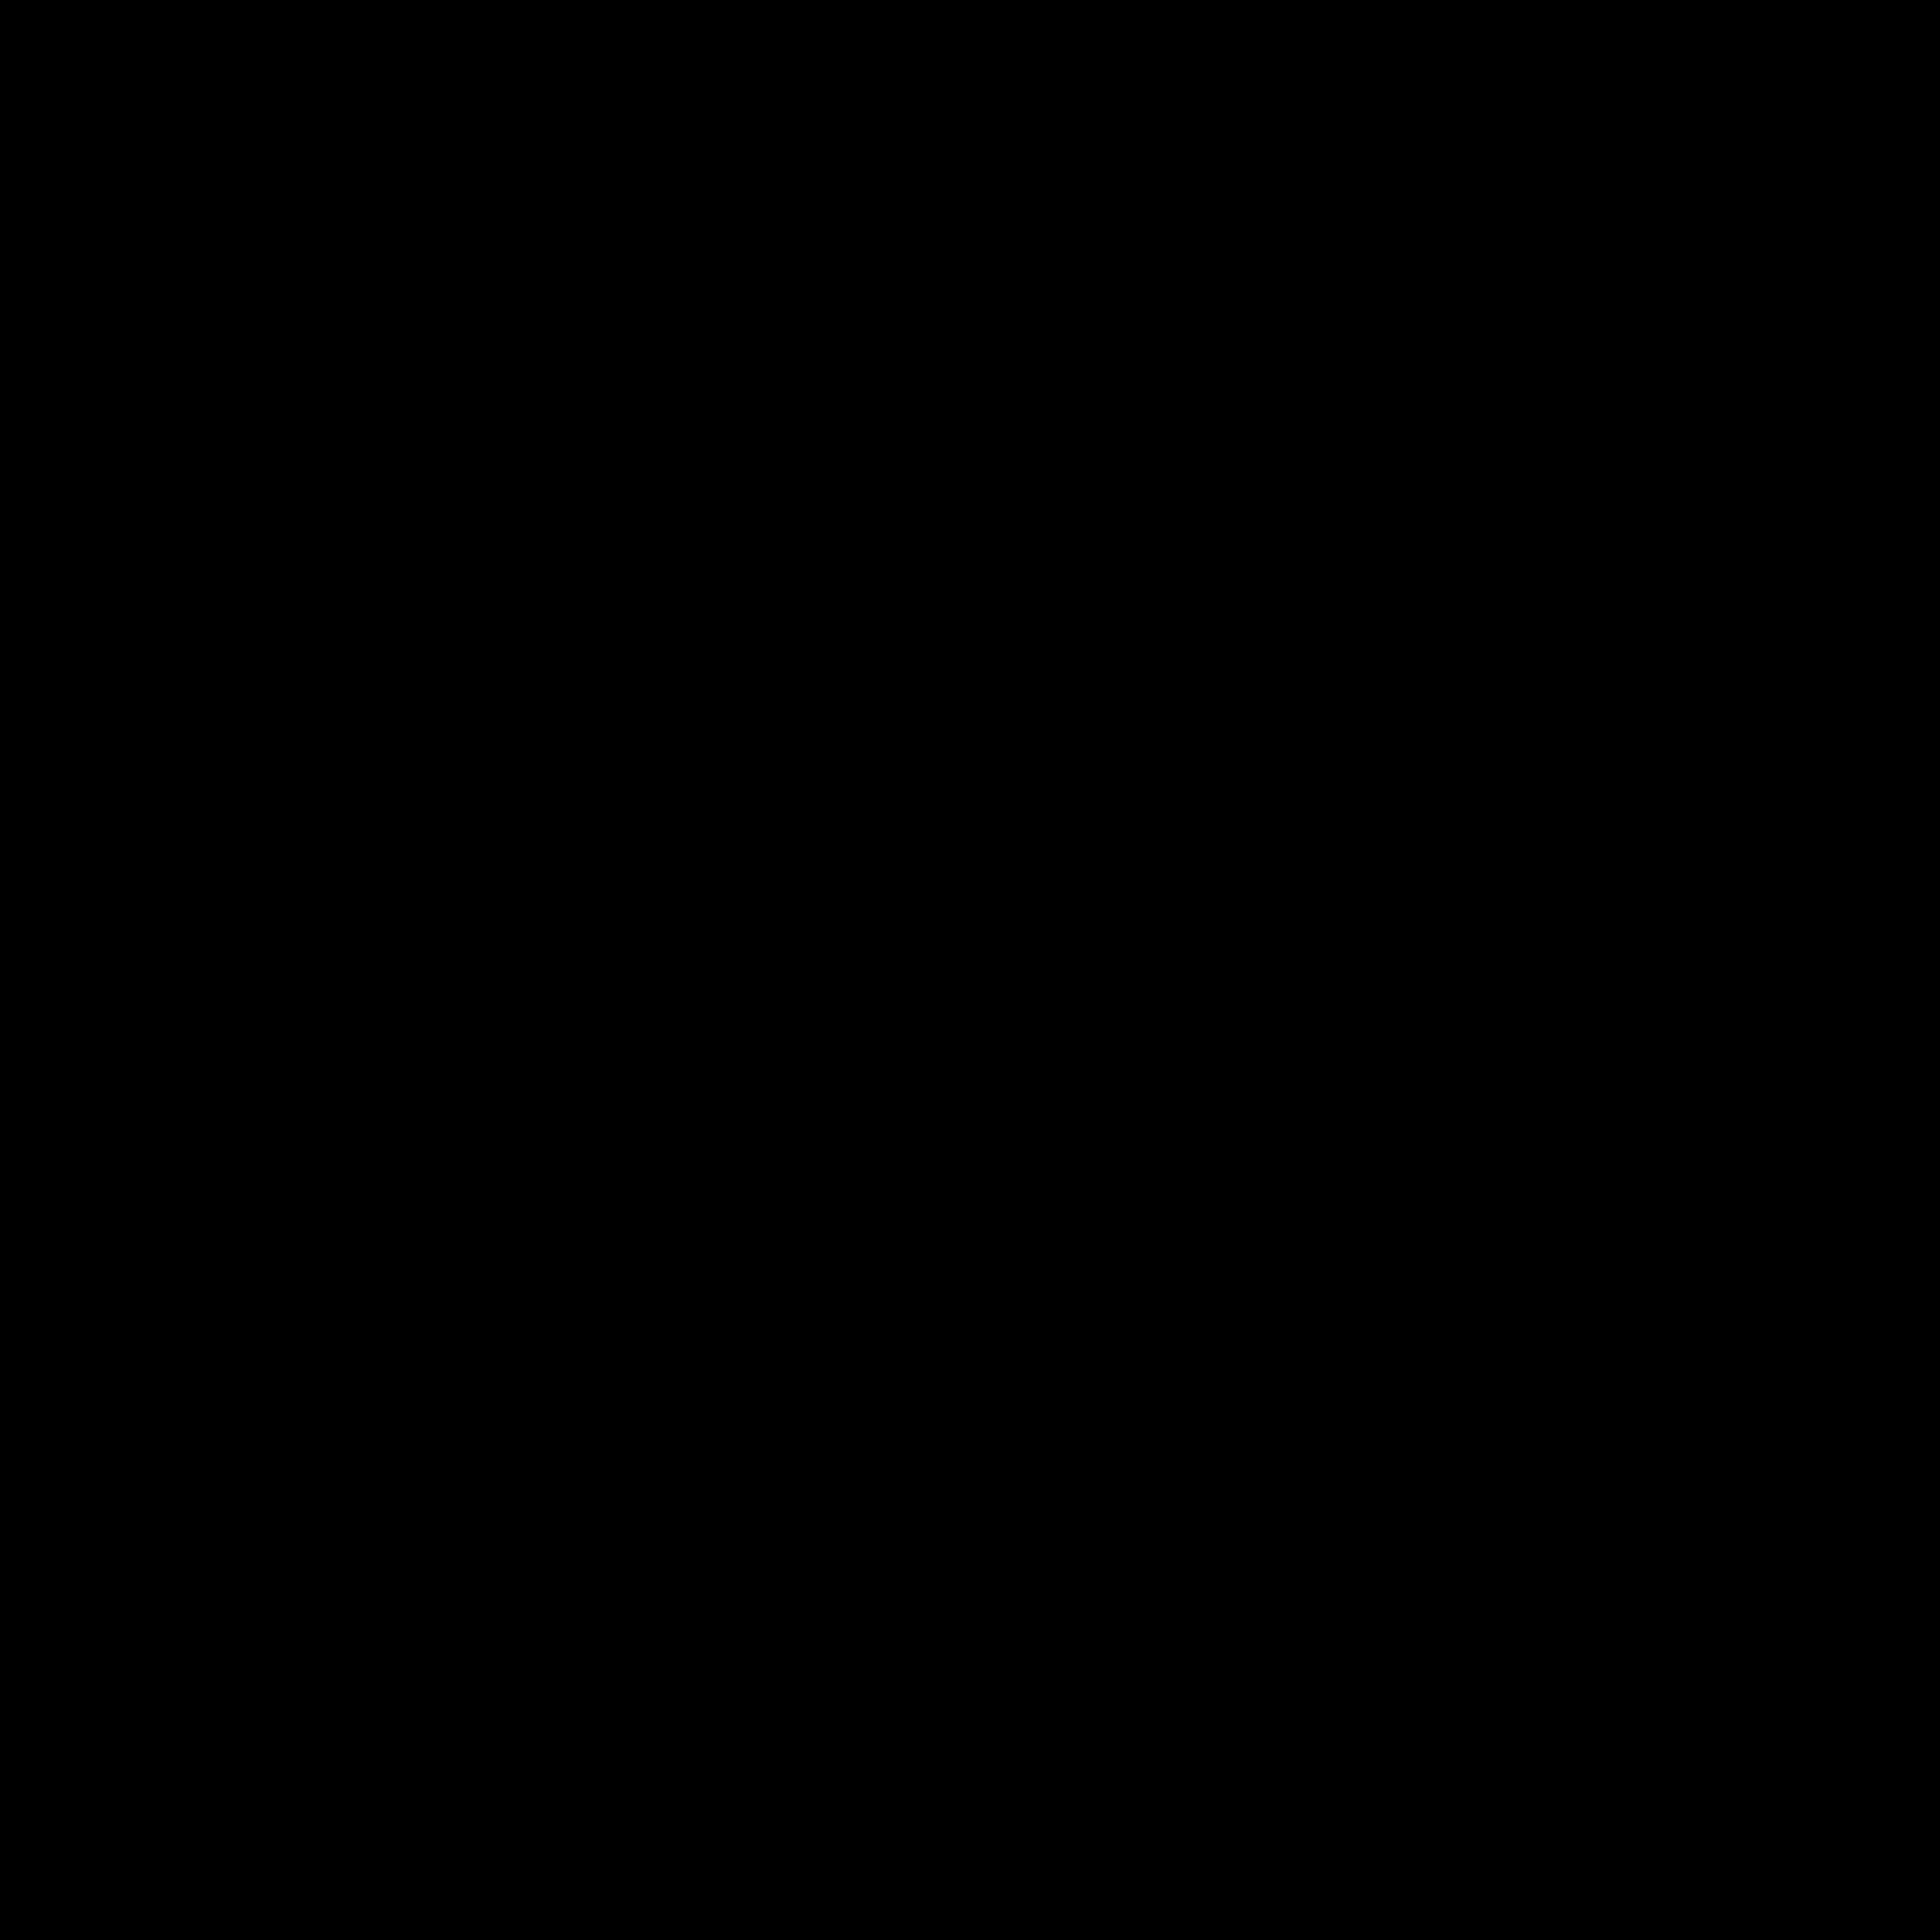 latex logo png transparent svg vector freebie supply rh freebiesupply com vector arrow above latex vector arrow above latex